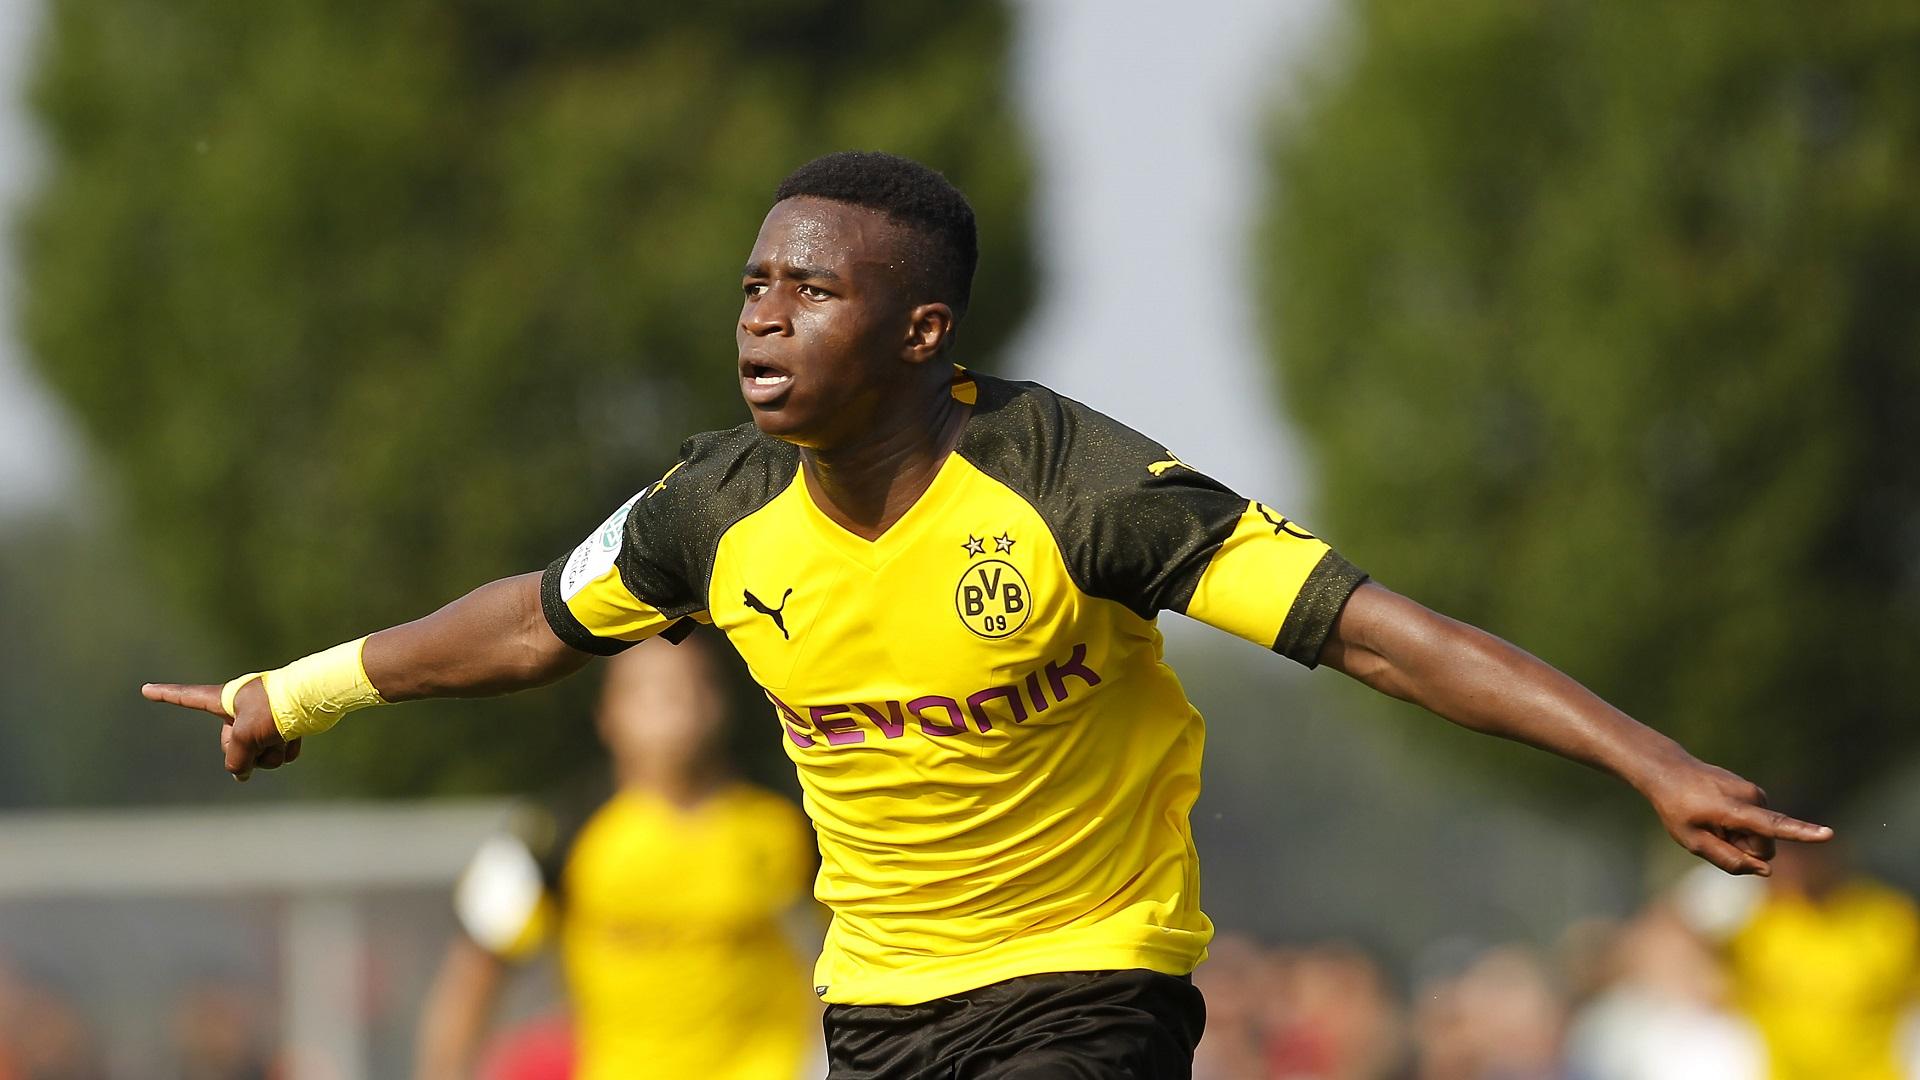 Germany coach Low: Borussia Dortmund wonderkid Moukoko is a rare talent |  Goal.com